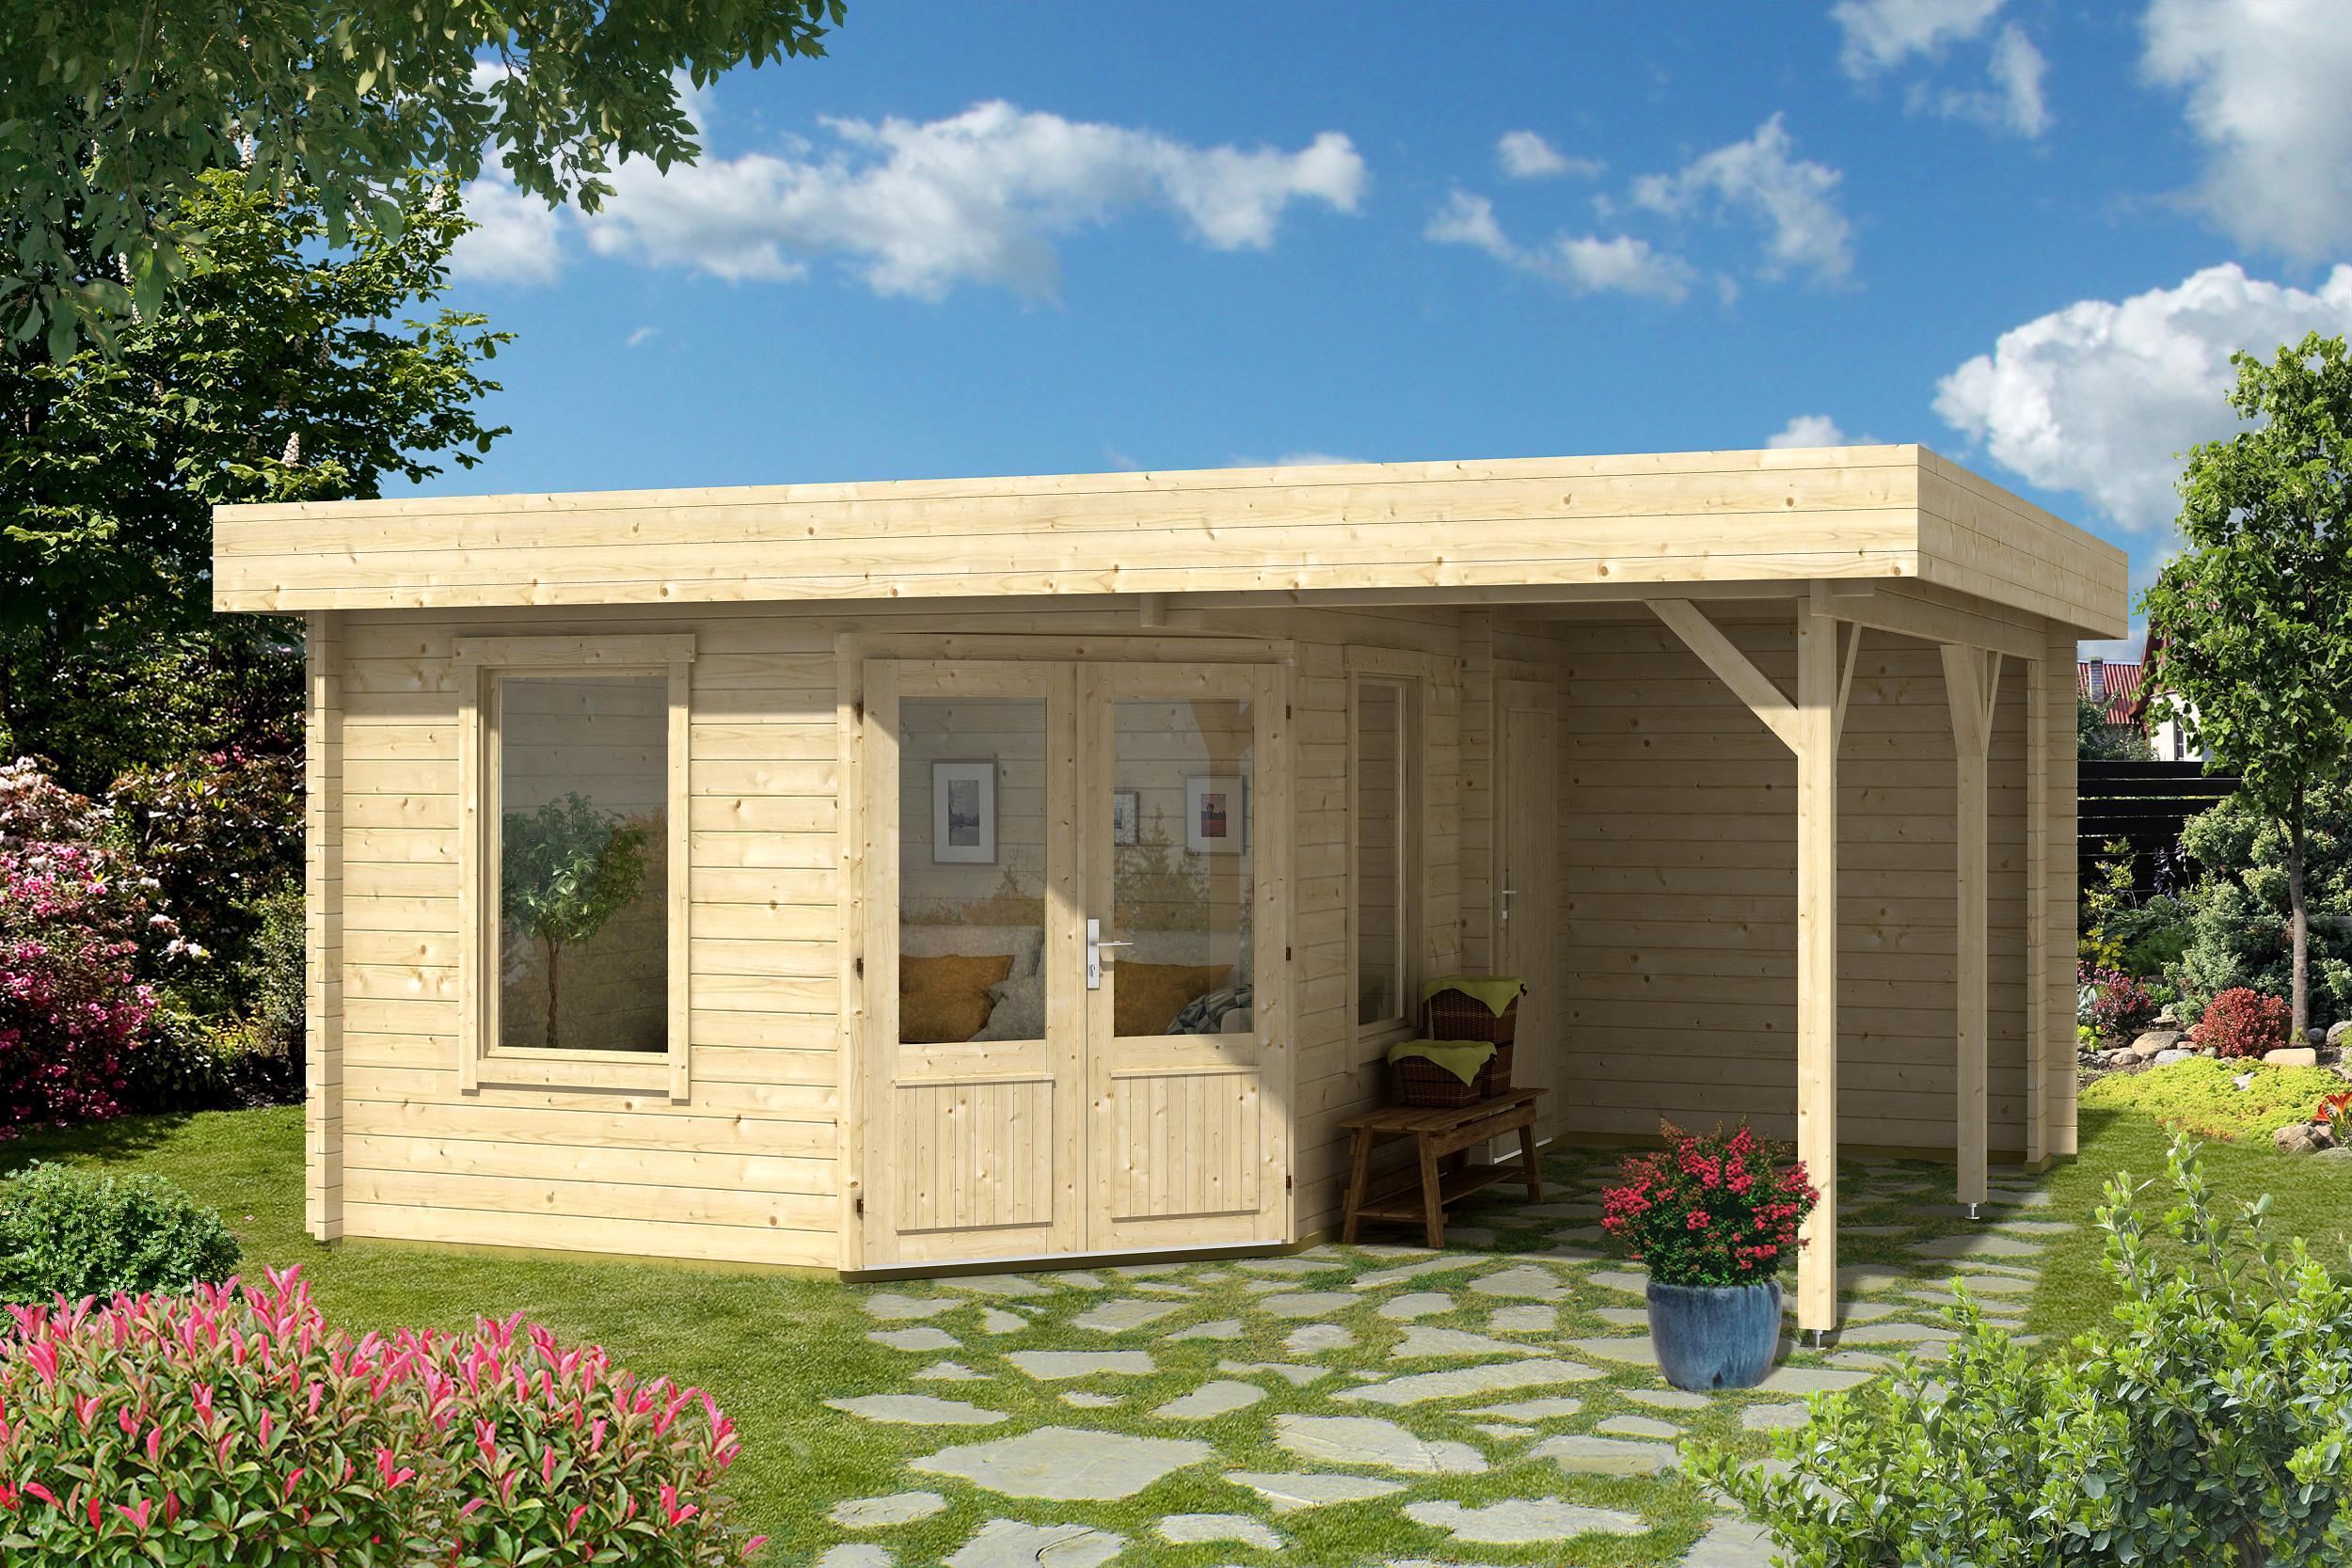 5 eck gartenhaus emili 40. Black Bedroom Furniture Sets. Home Design Ideas